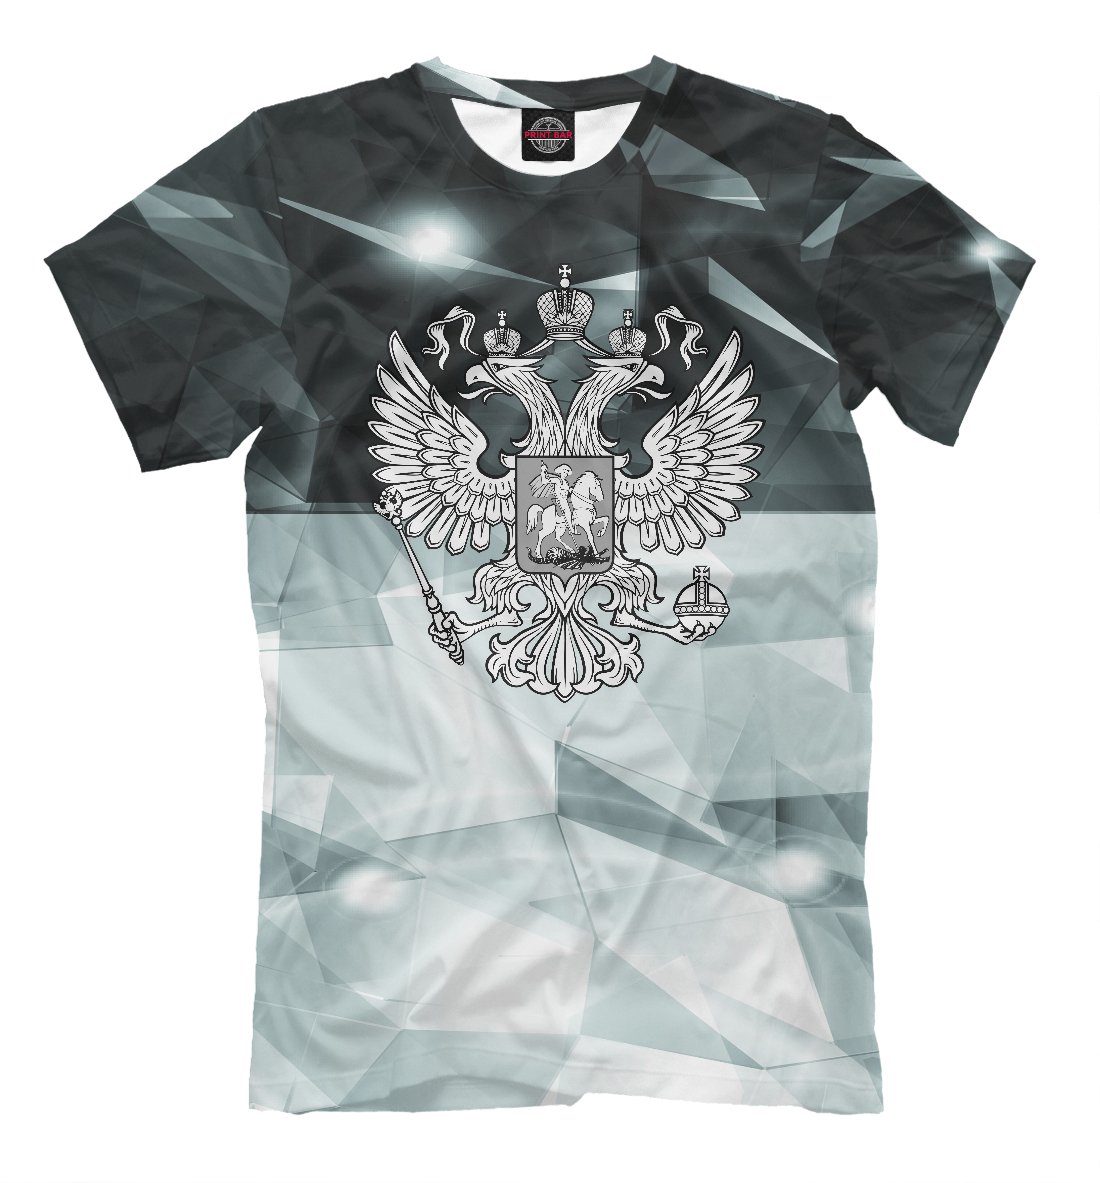 Купить Герб России Black&White, Printbar, Футболки, SRF-678654-fut-2